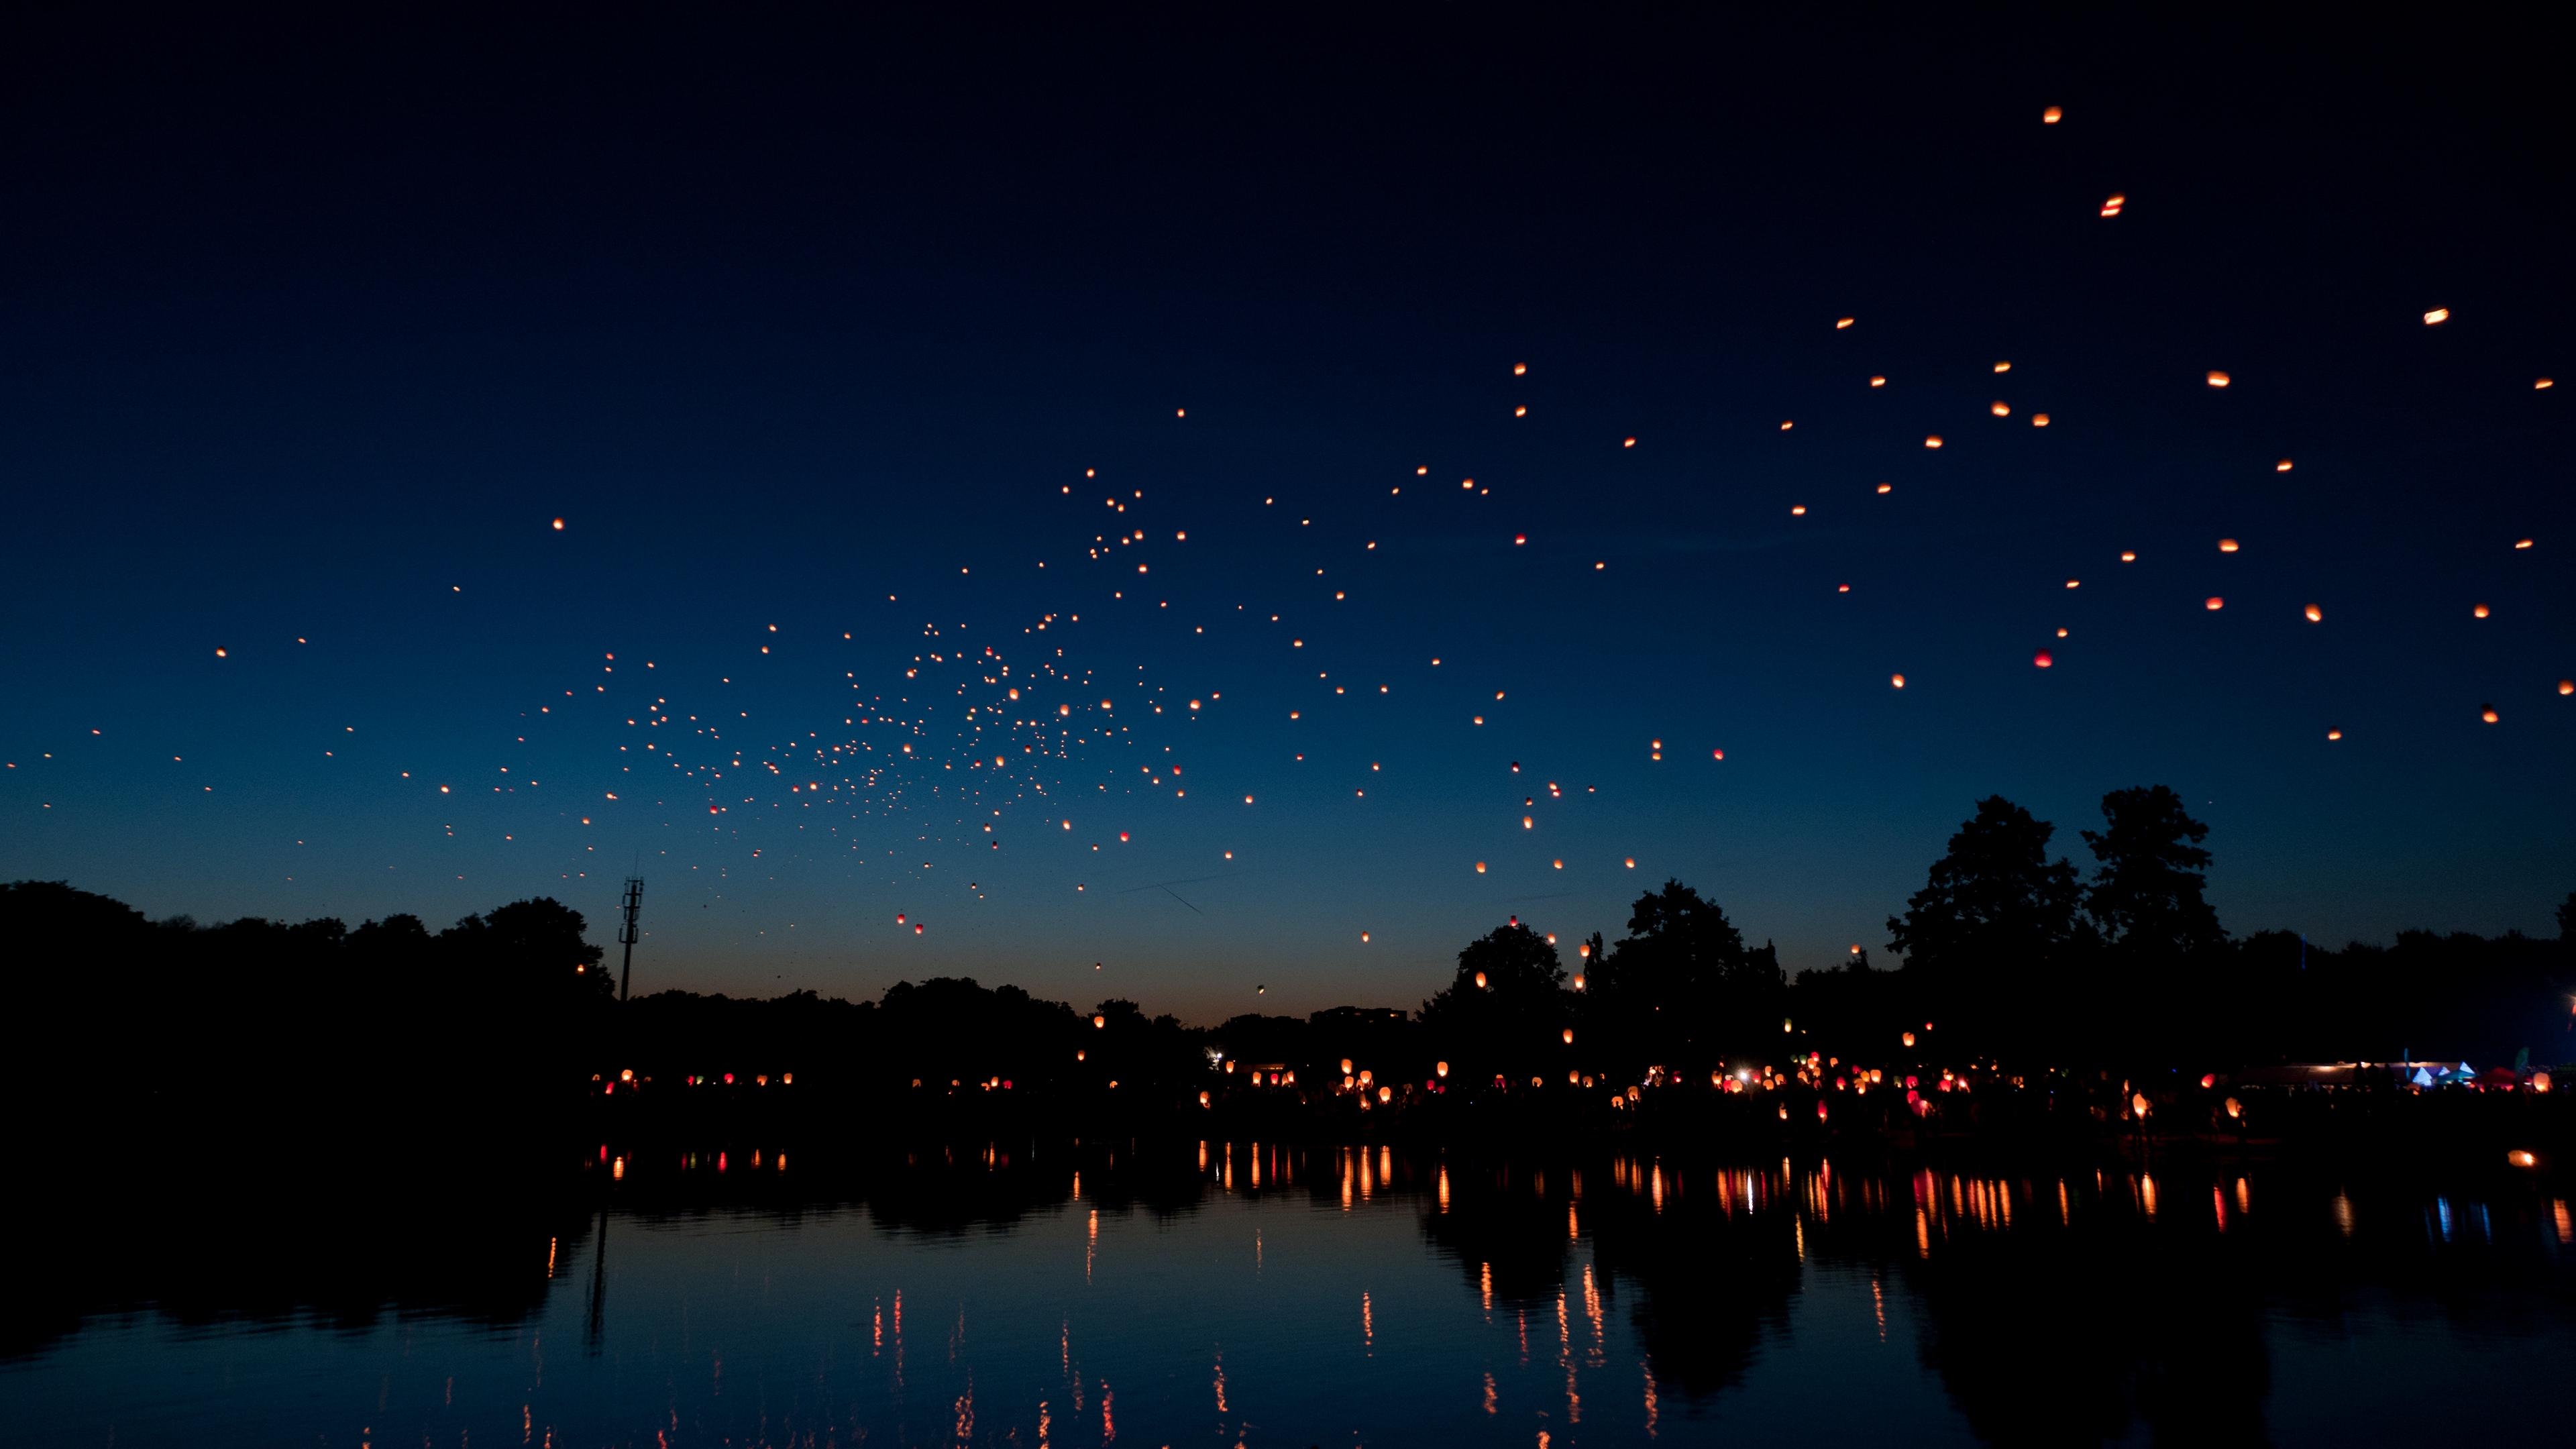 chinese lanterns sky lanterns night river holiday 4k 1538068533